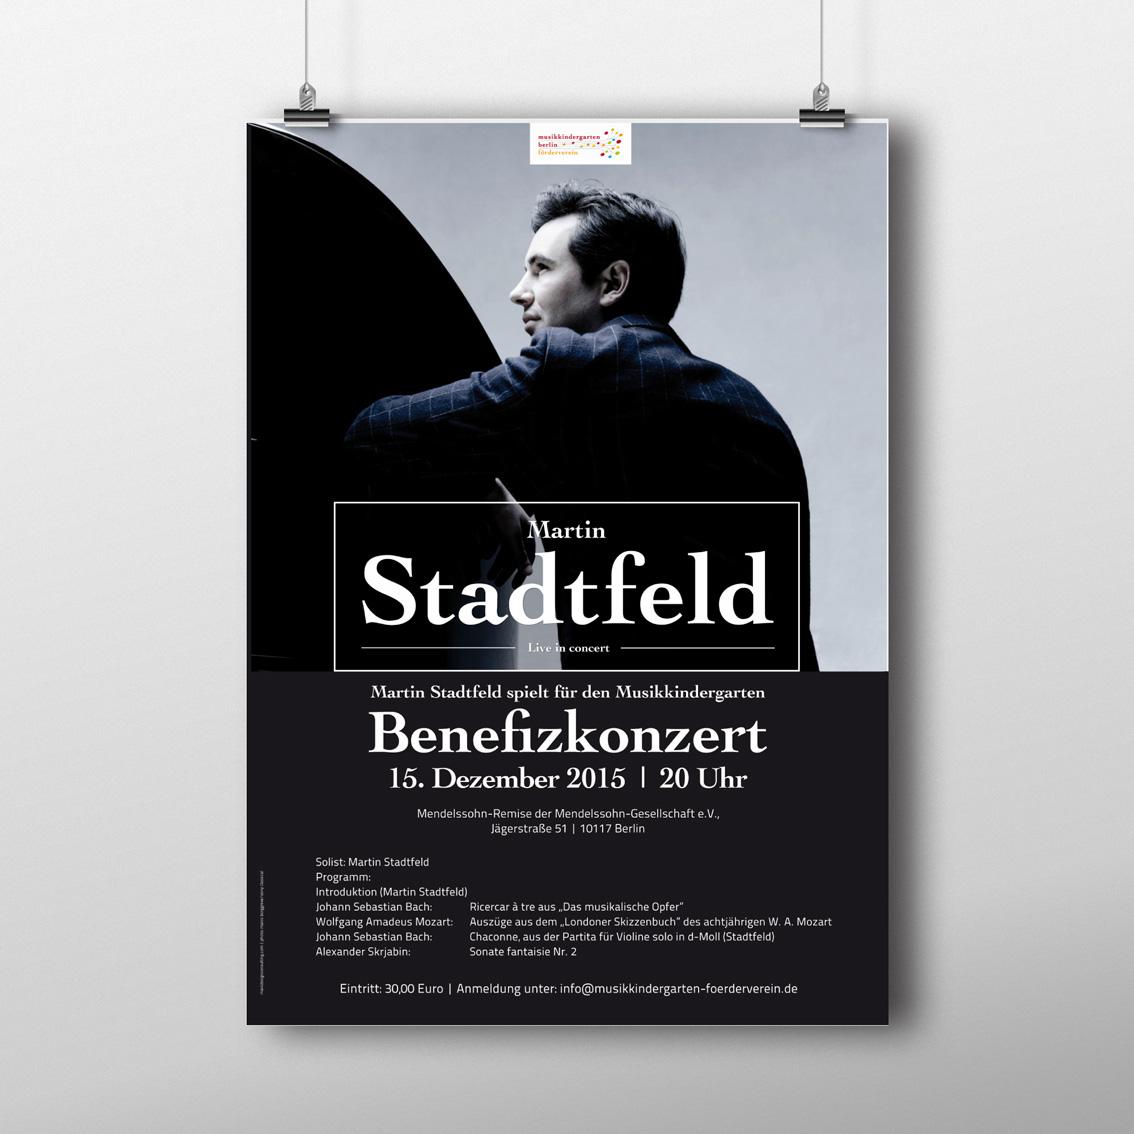 Stadtfeld_poster_mockup_v1.0_timeasley